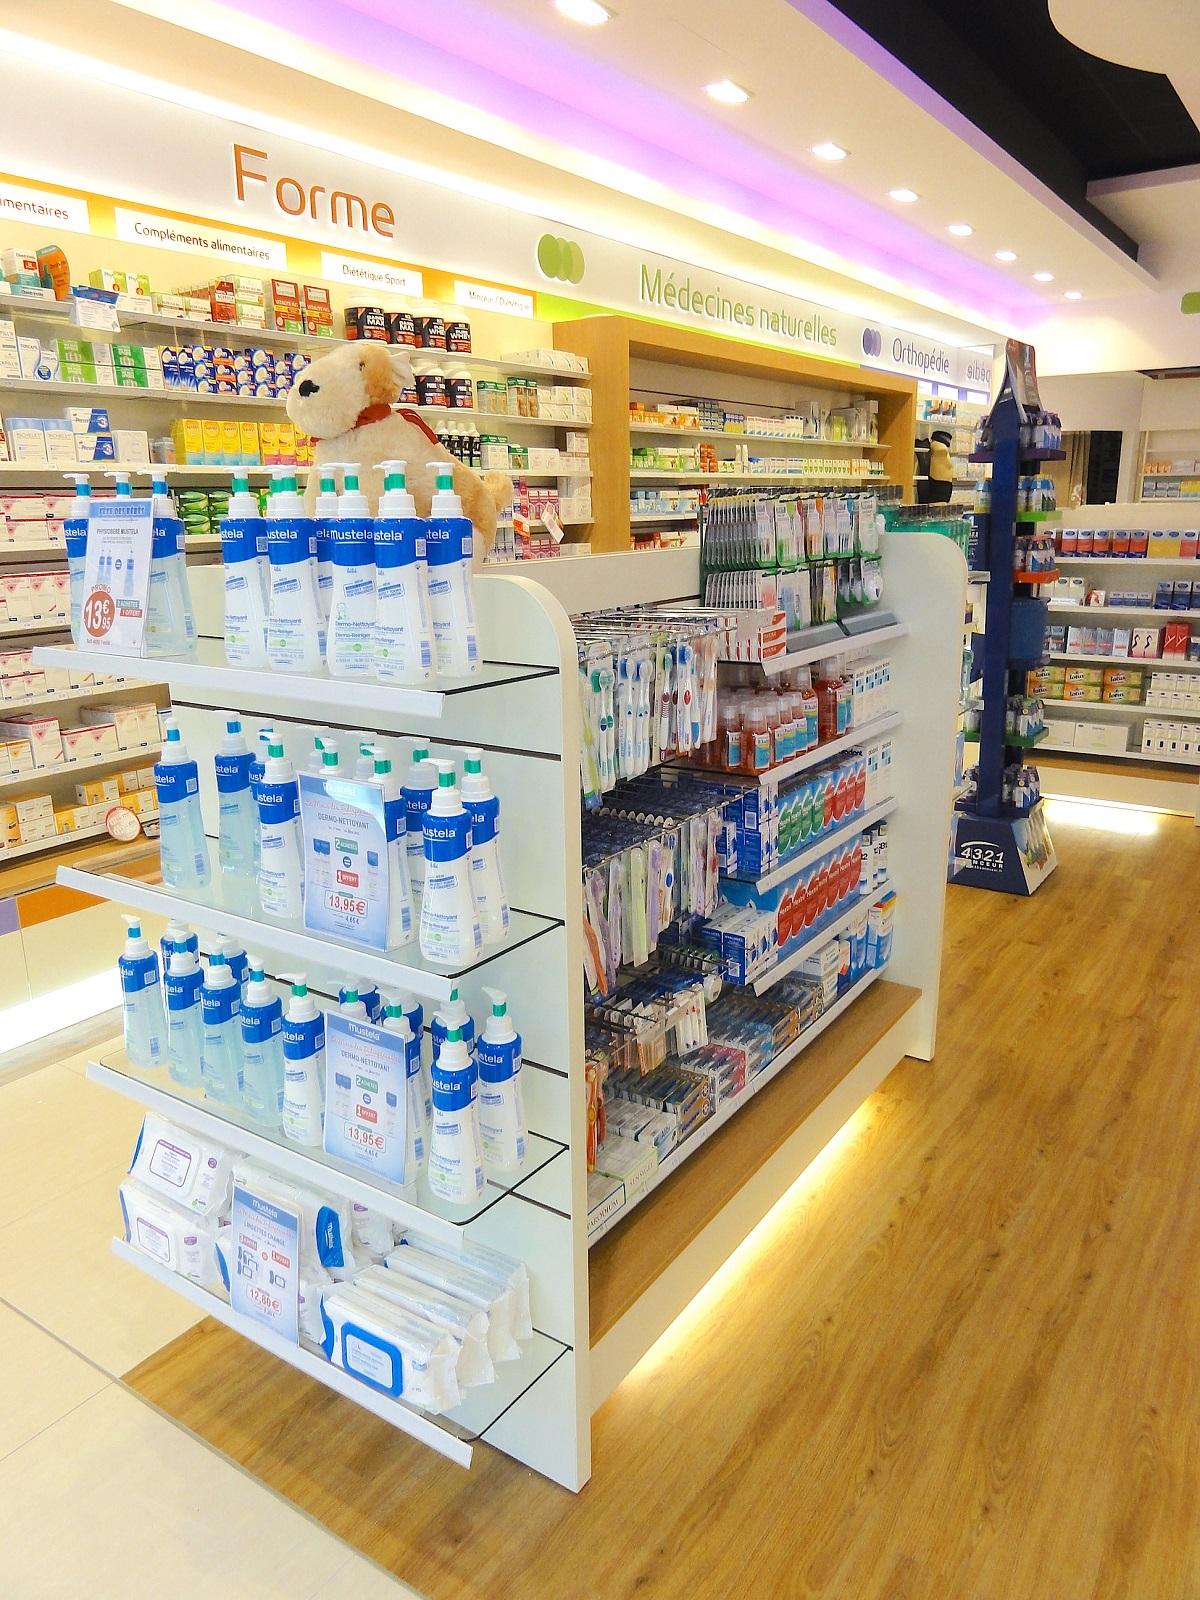 dimitri-danger-maitre-oeuvre-pharmacie-normandie05